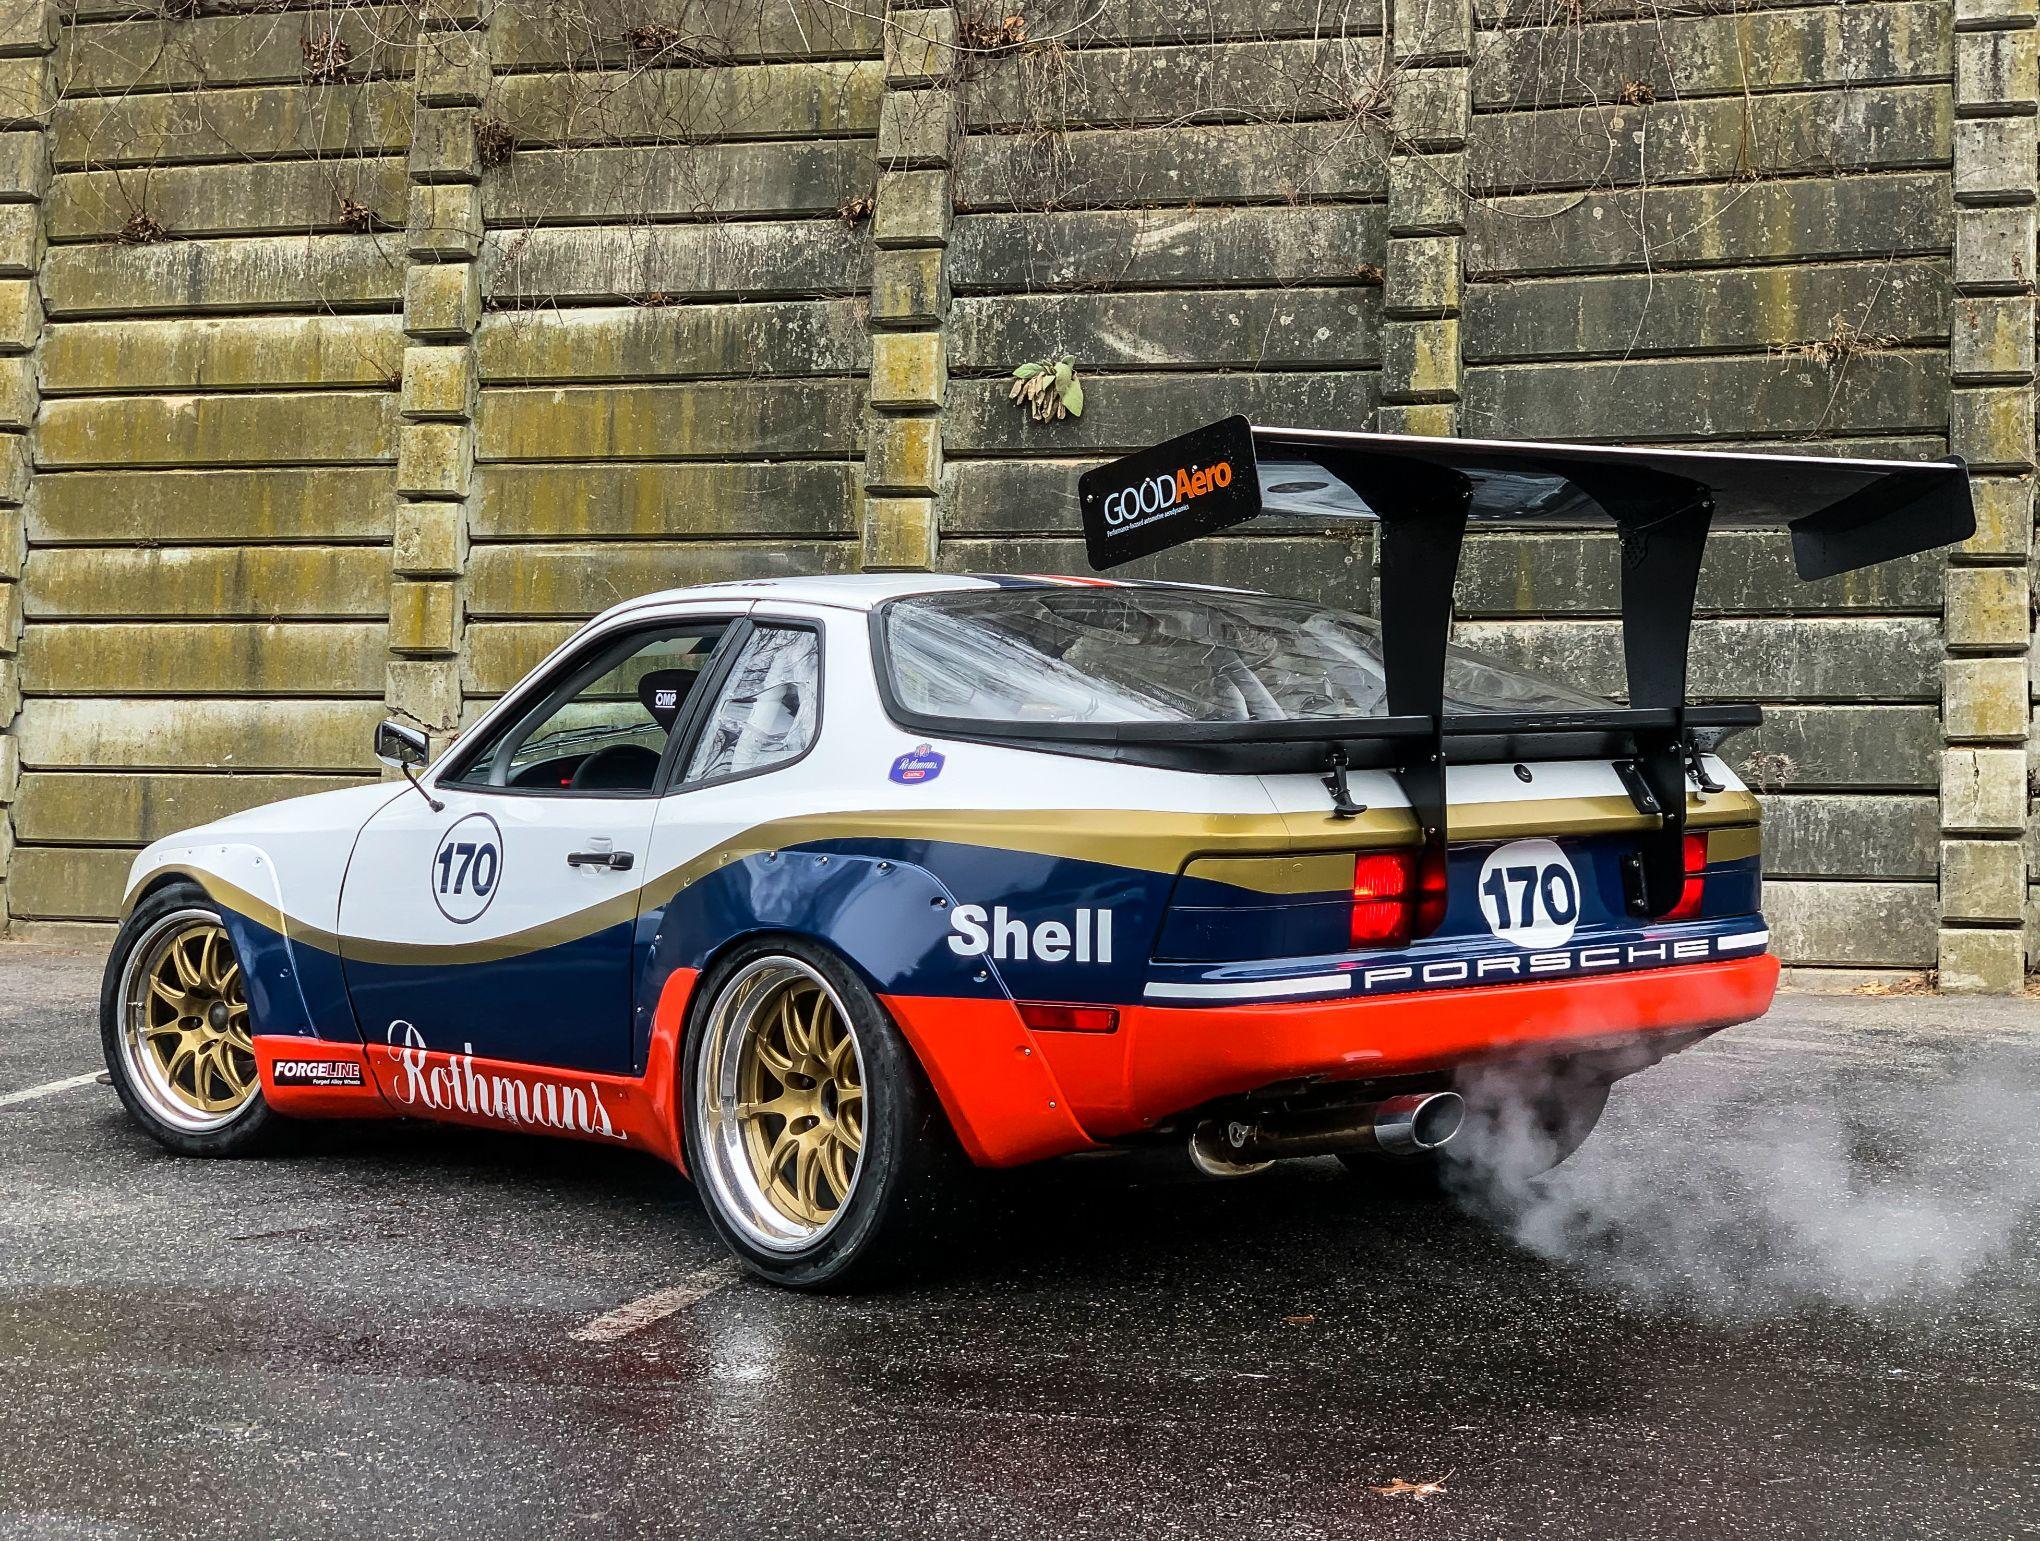 Dt 1989 Porsche 944 Turbo S Racecar Pcarmarket